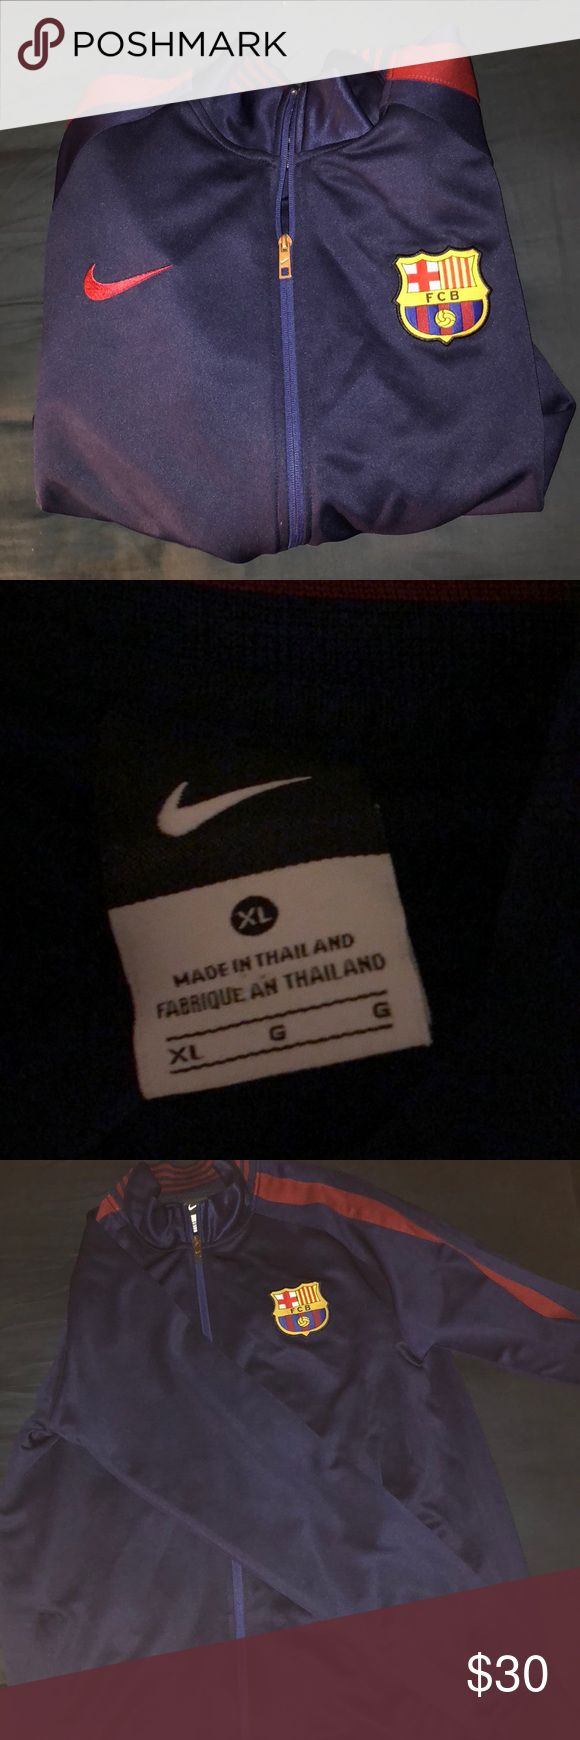 FC Barcelona jacket Fc Barcelona jacket, good condition. Jackets & Coats Performance Jackets